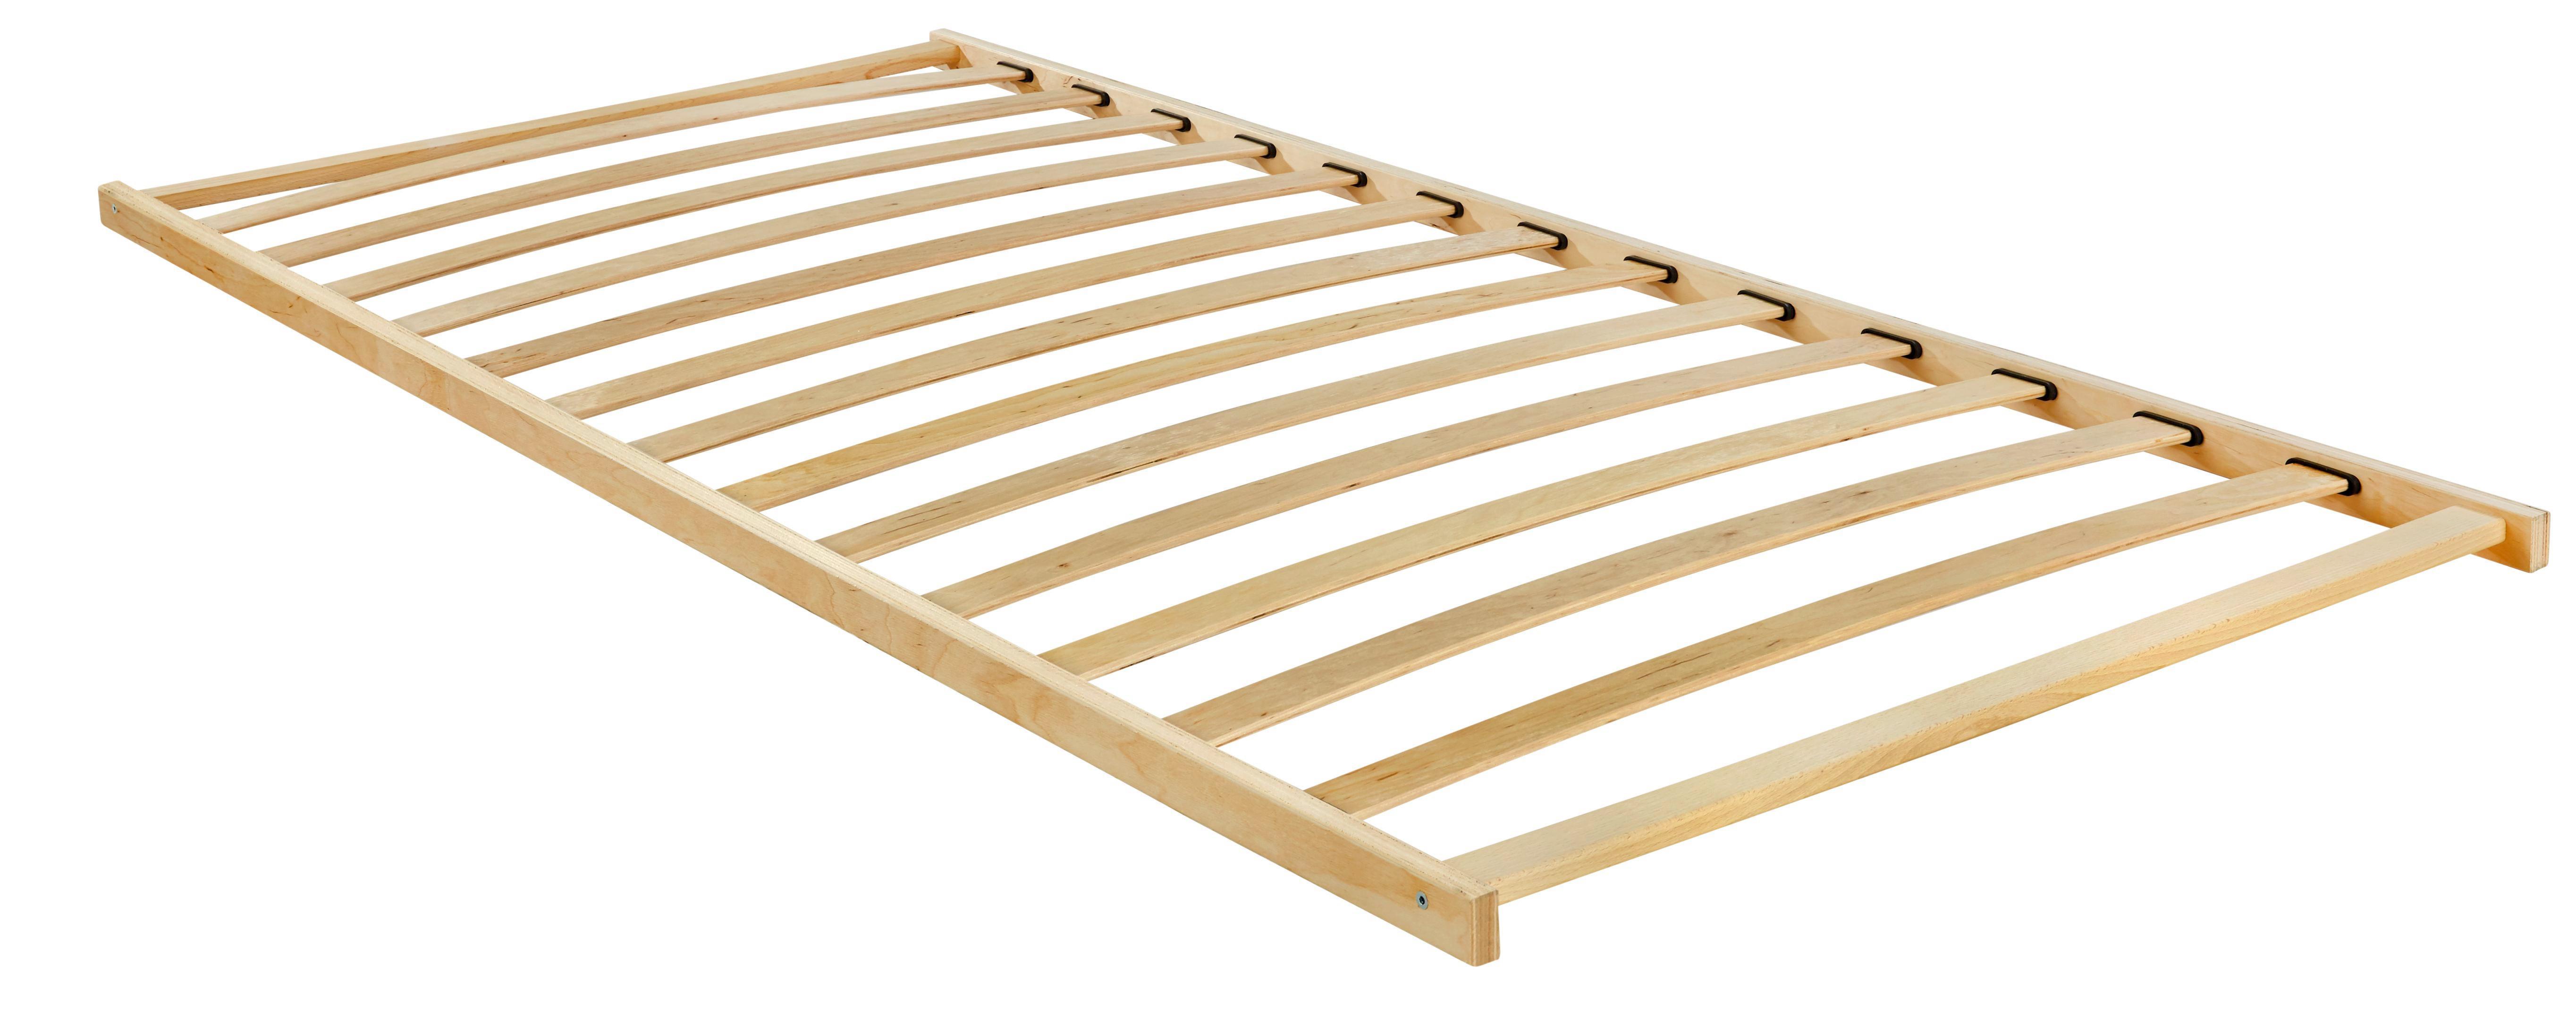 Lattenrost aus Holz, ca. 90x200cm - (90/200cm) - NADANA